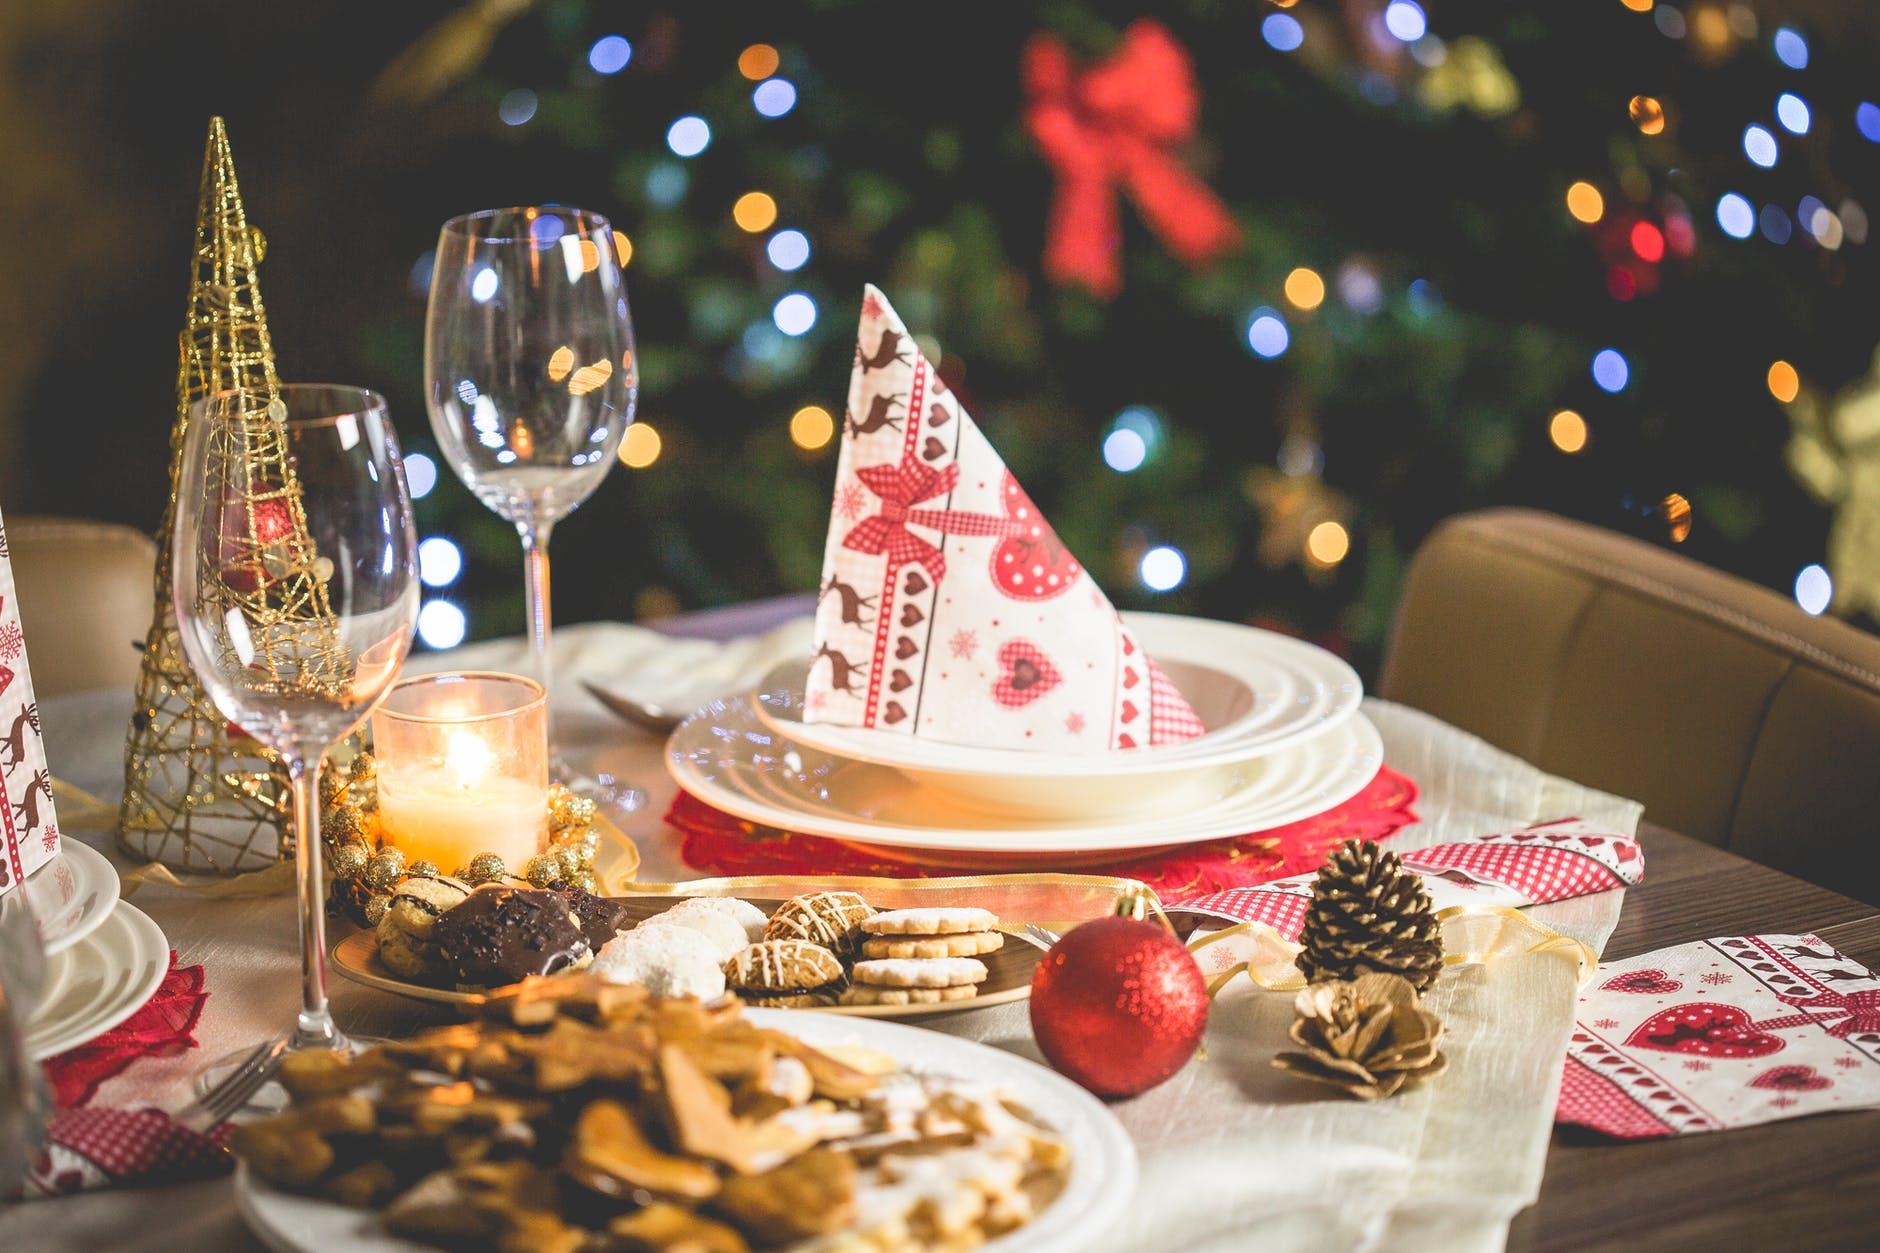 8 Hearty Vegetarian Recipes for Christmas Dinner